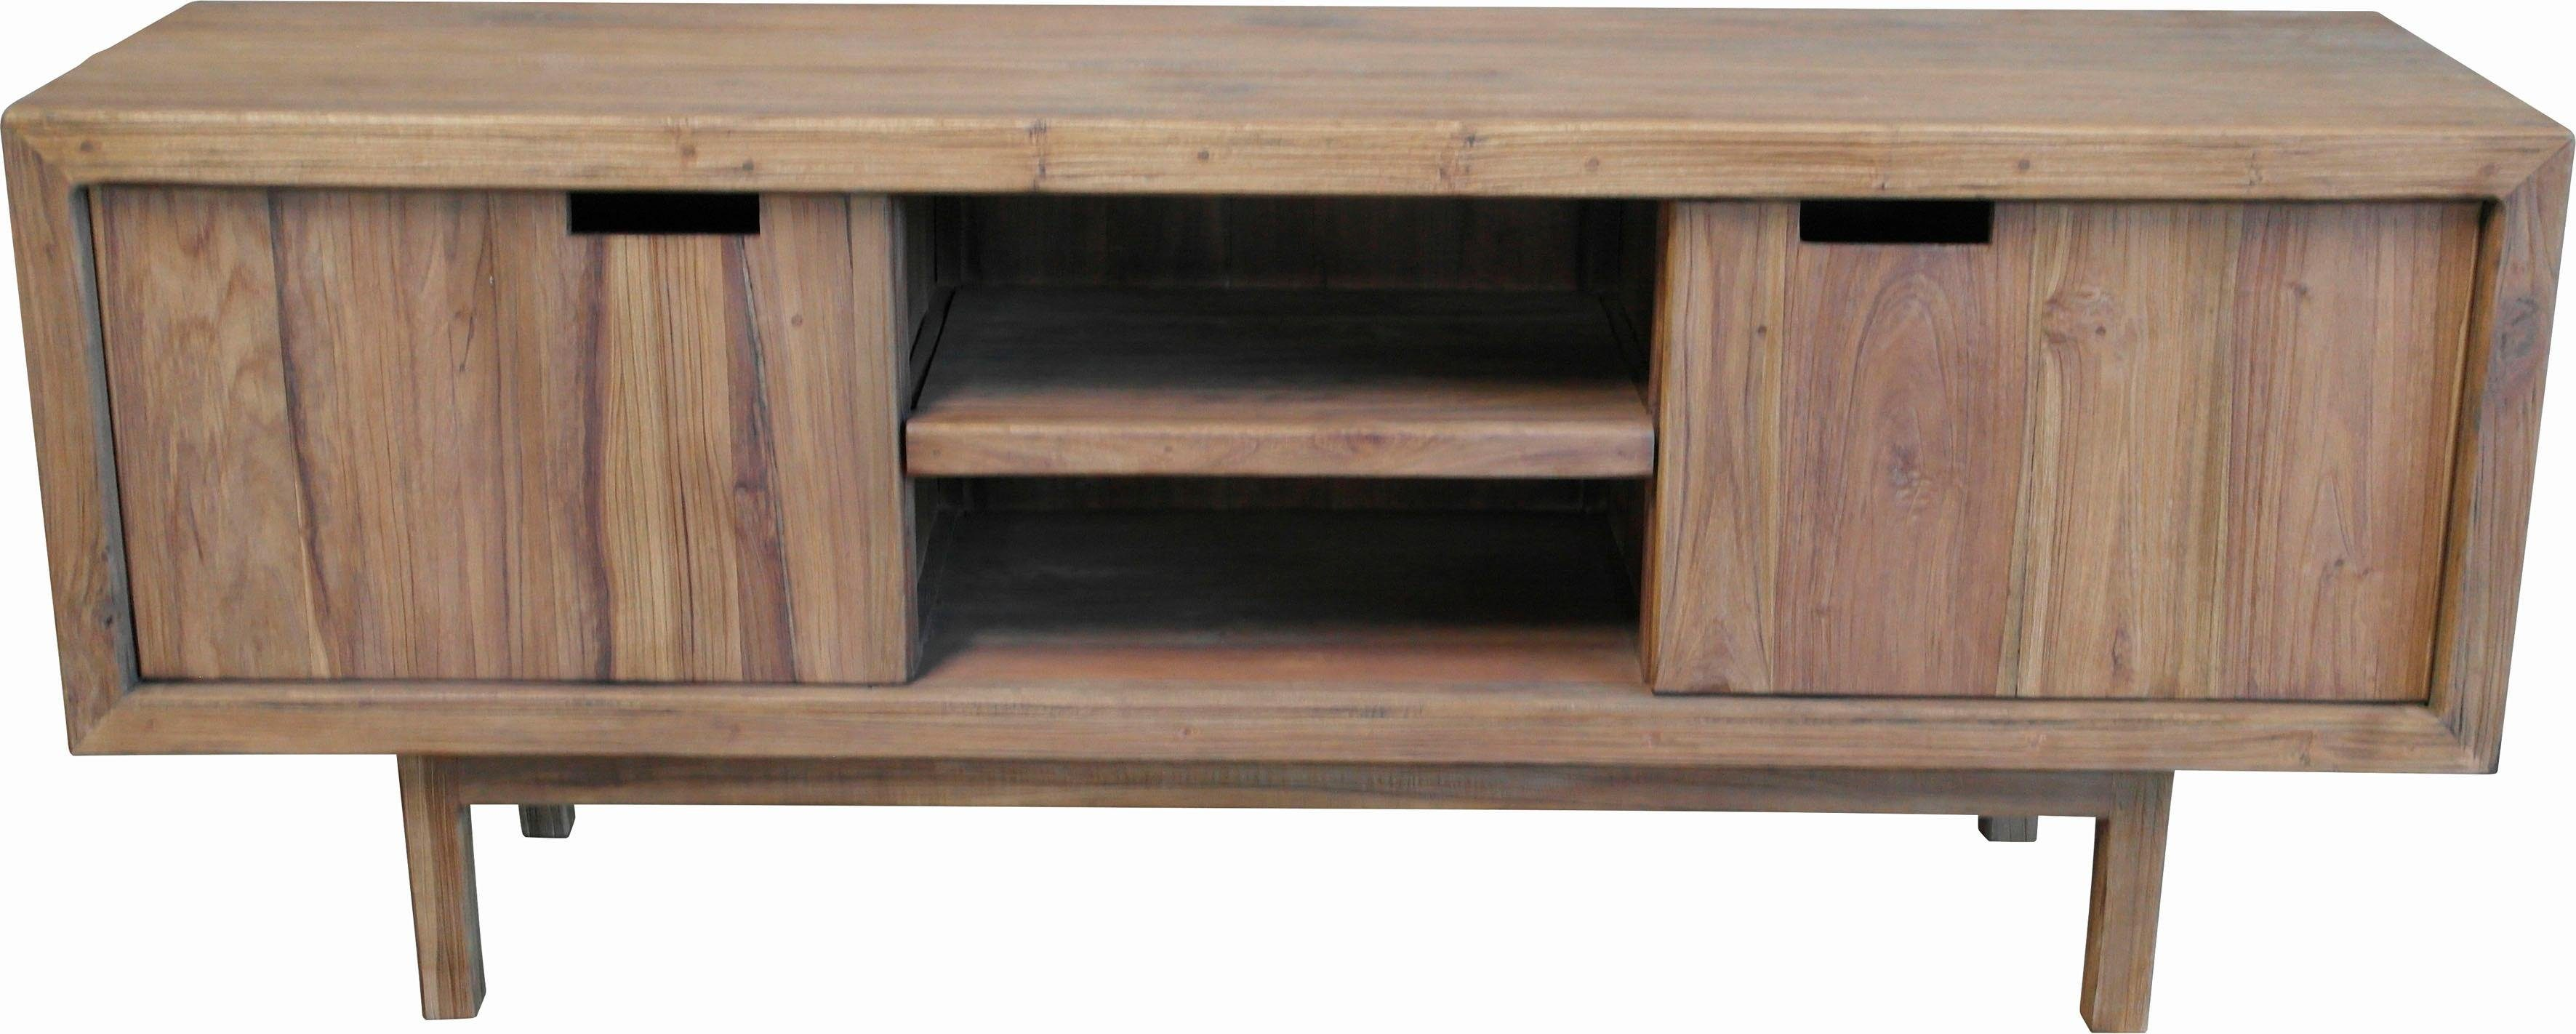 SIT Lowboard »Sanur« aus recyceltem Altholz Teak, Breite 156 cm